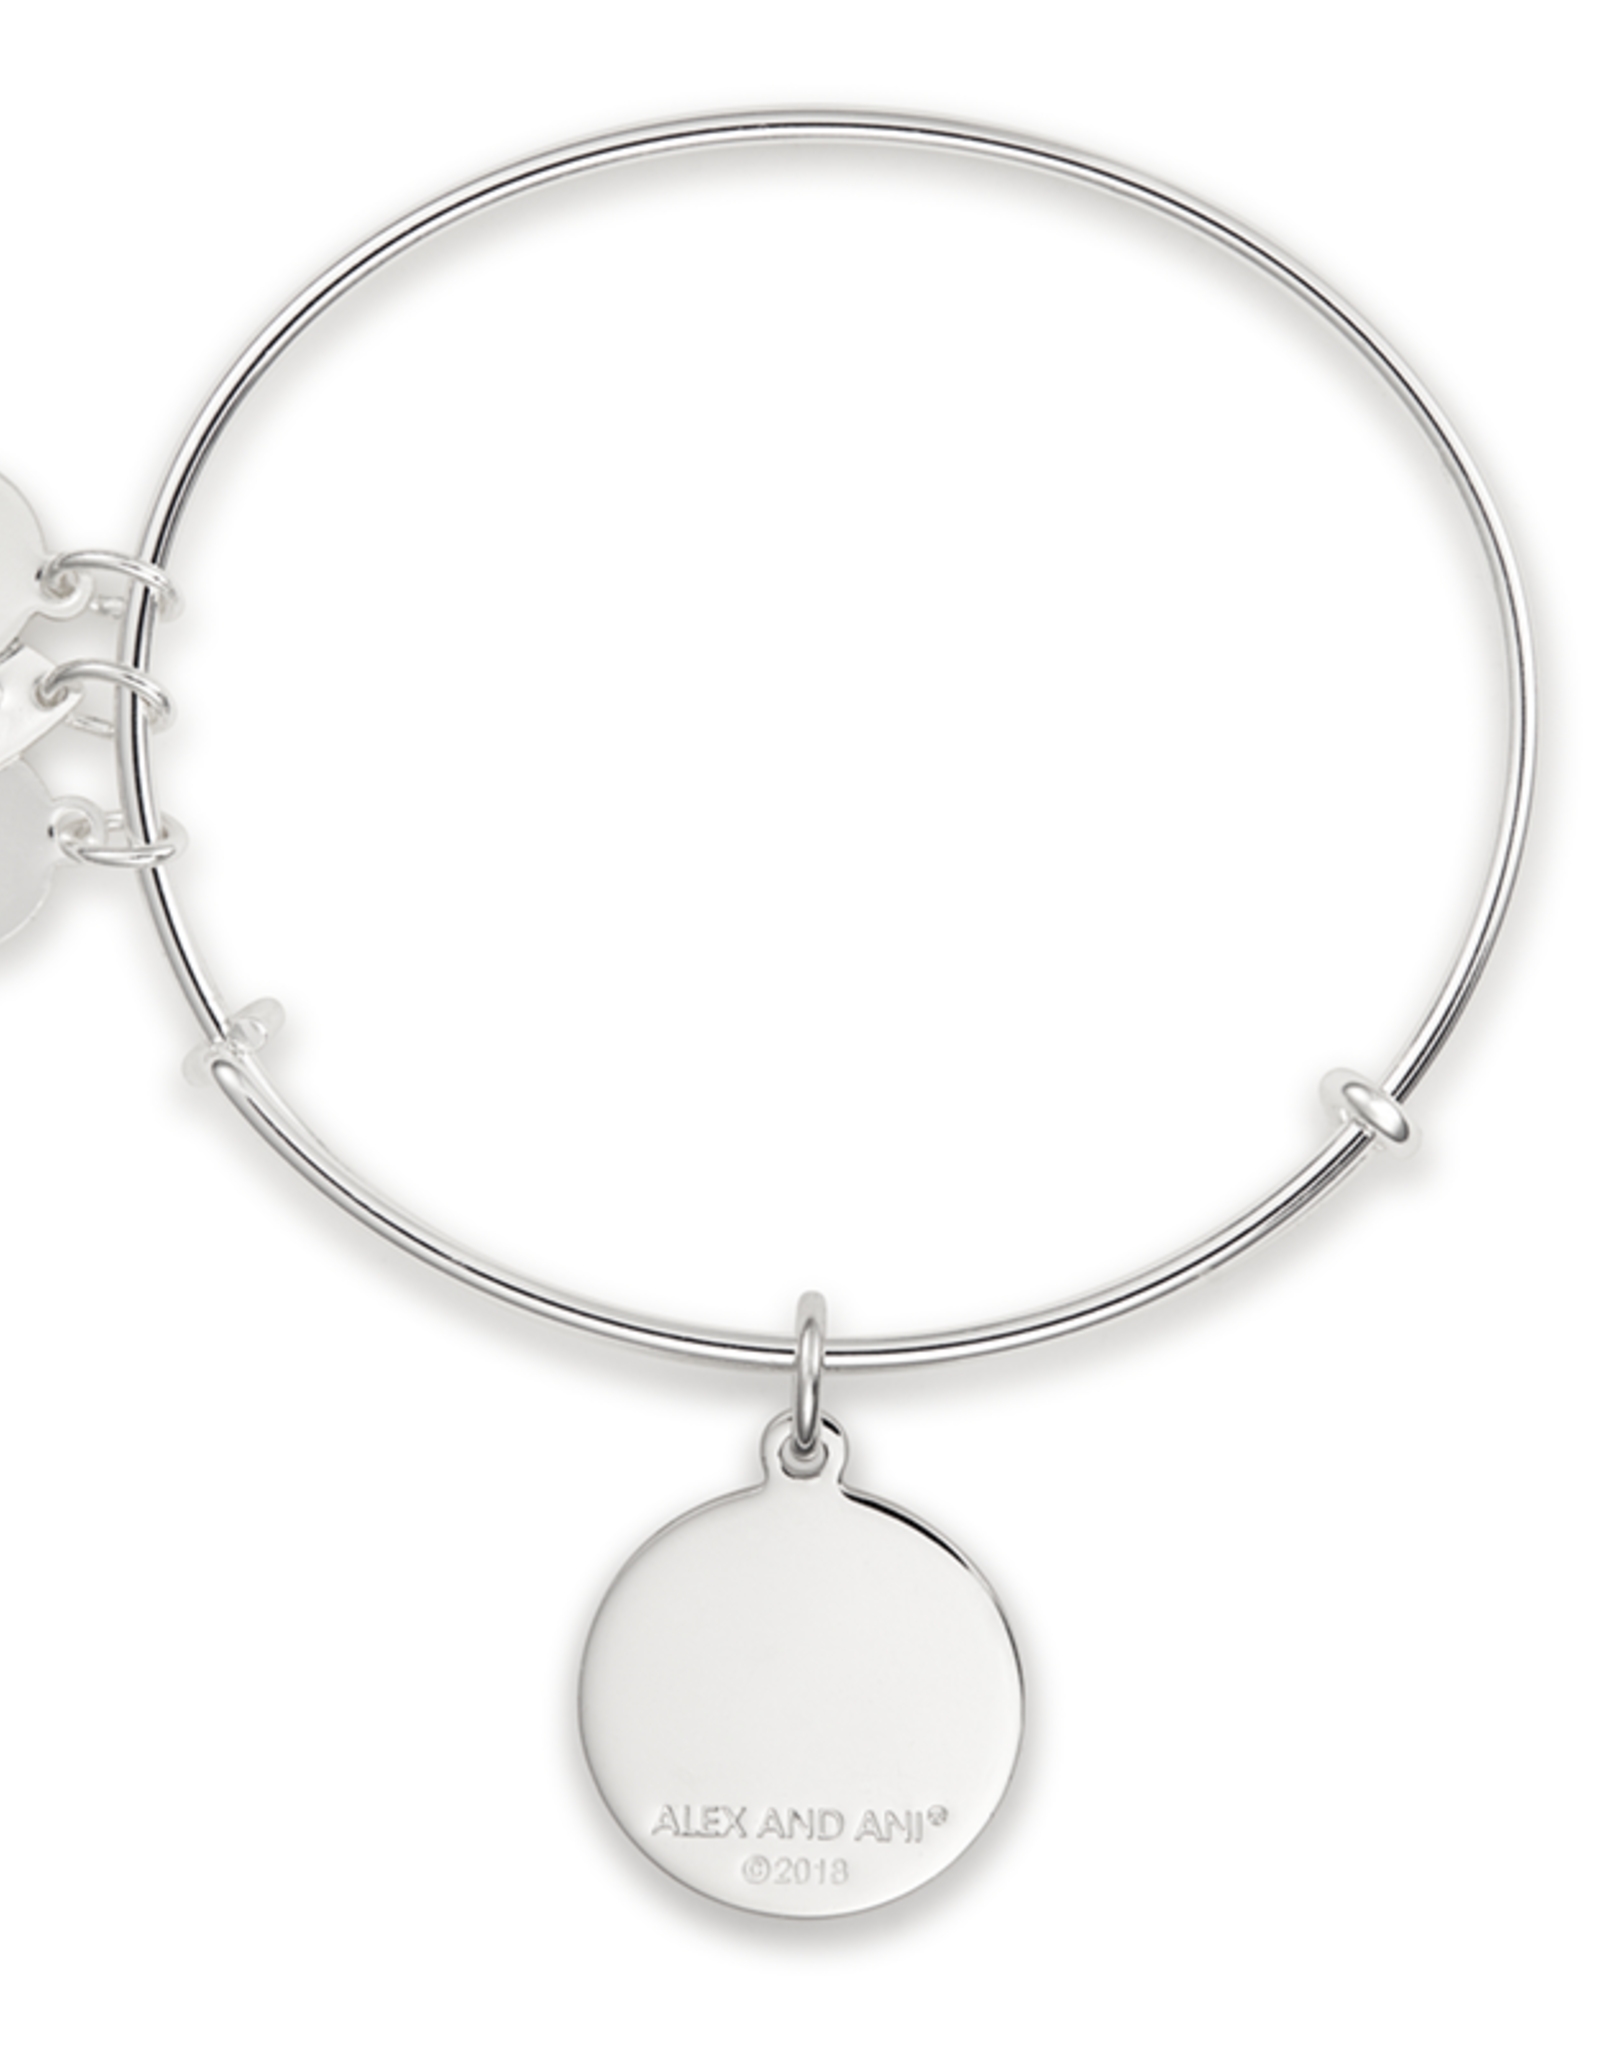 Alex and Ani Sweet 16 Charm Bracelet, Shiny Silver